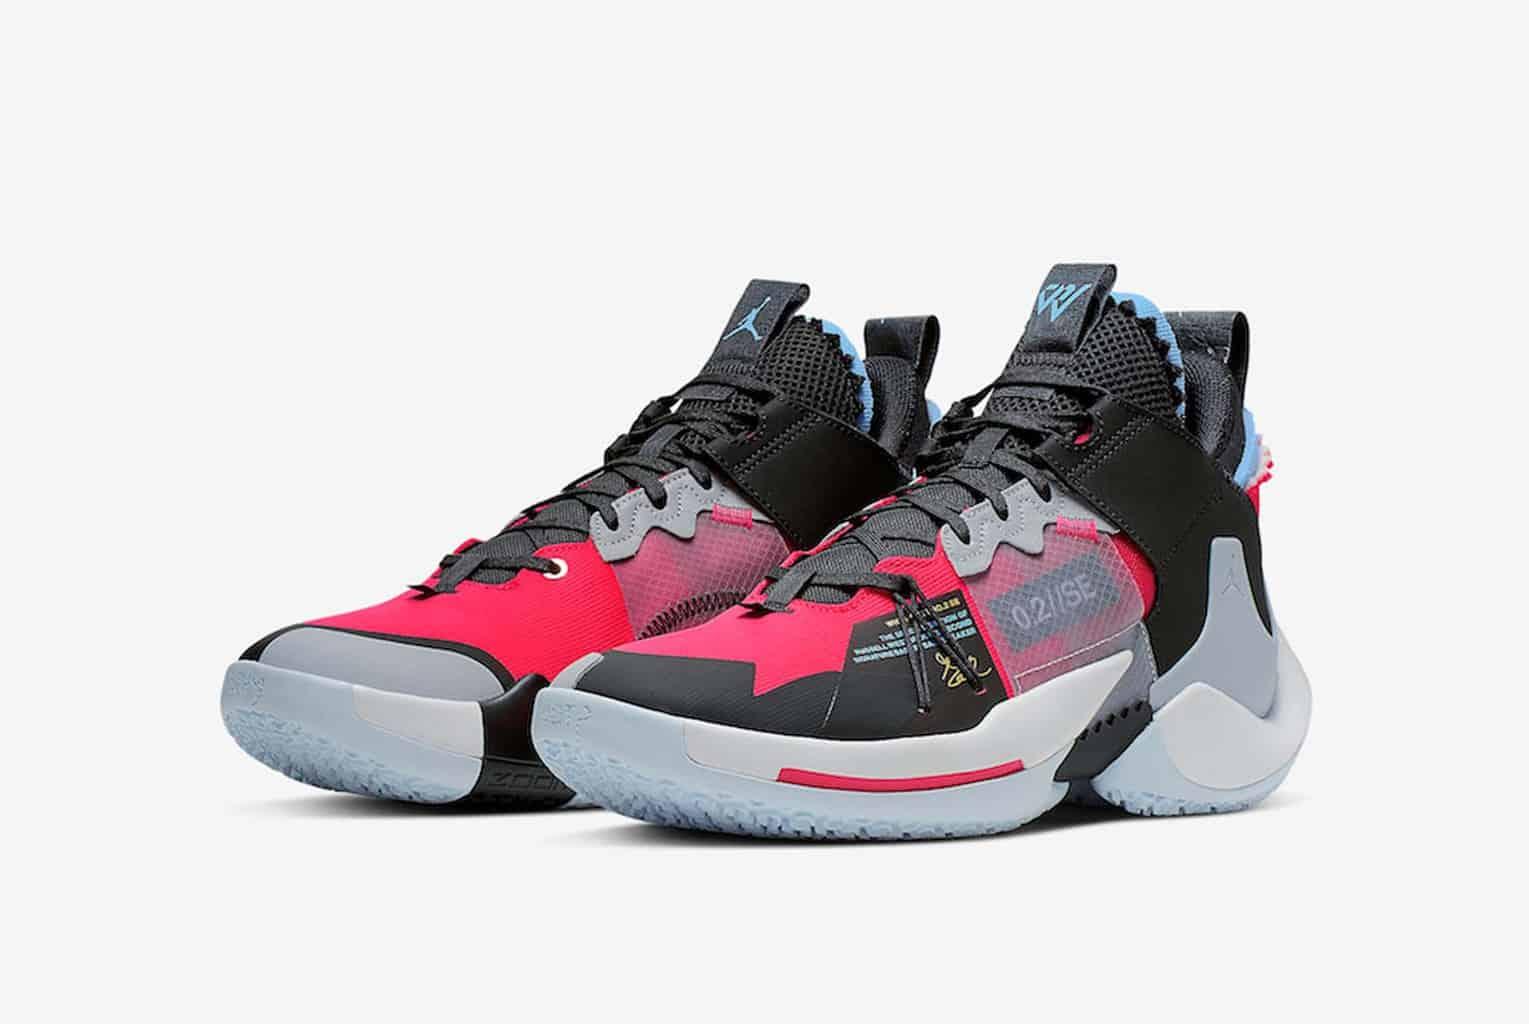 Jordan Why Not Zer0.2 SE Sneaker